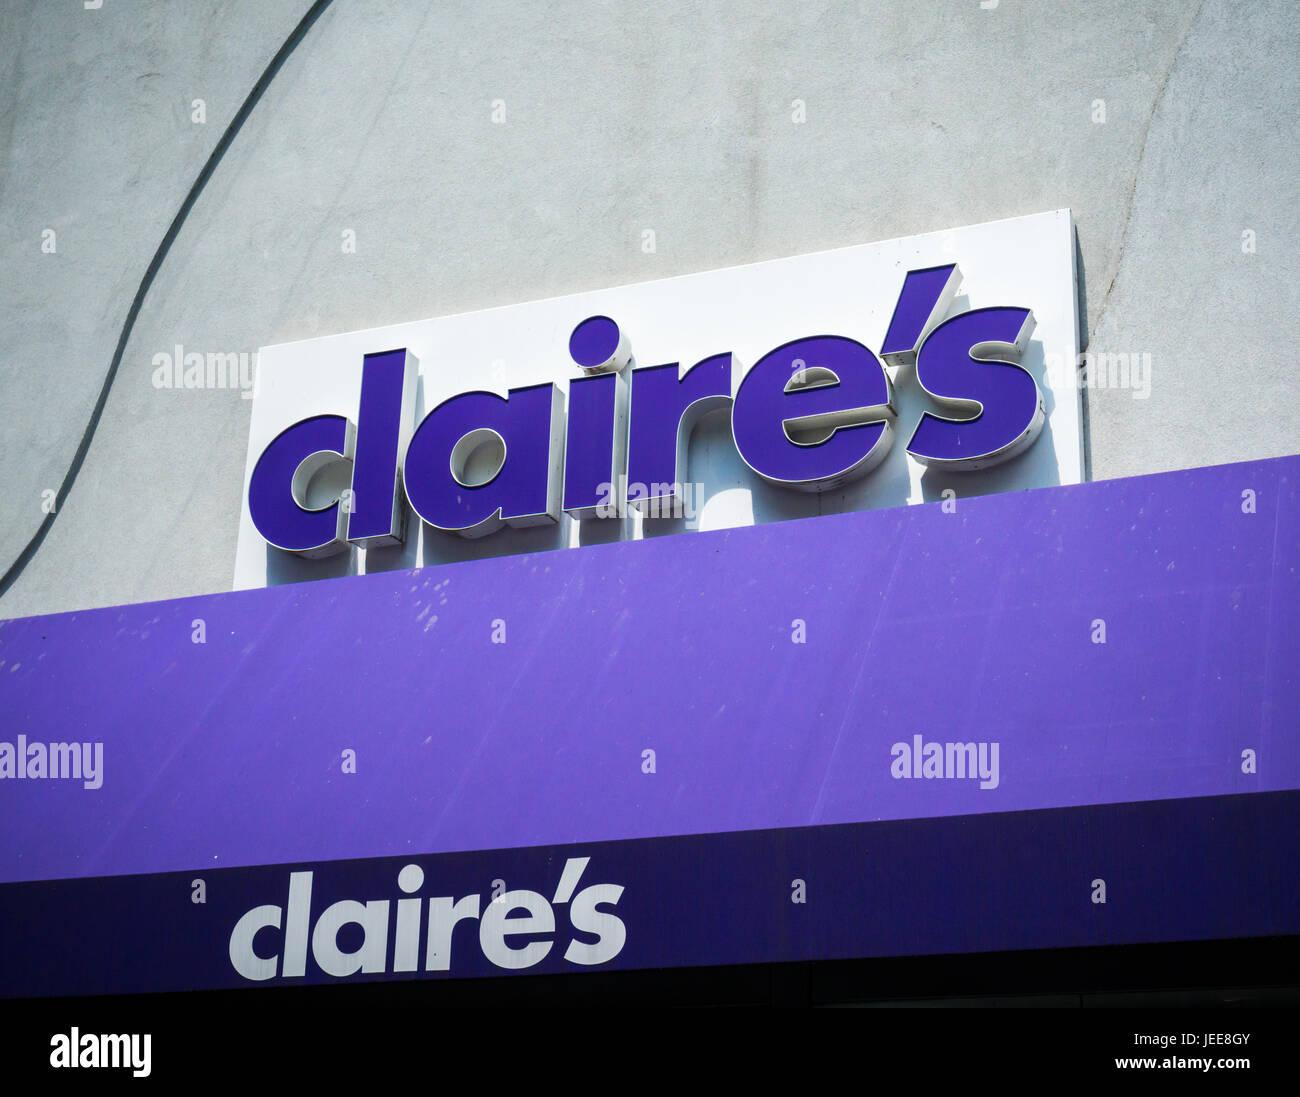 Claire's modeschmuck online shop